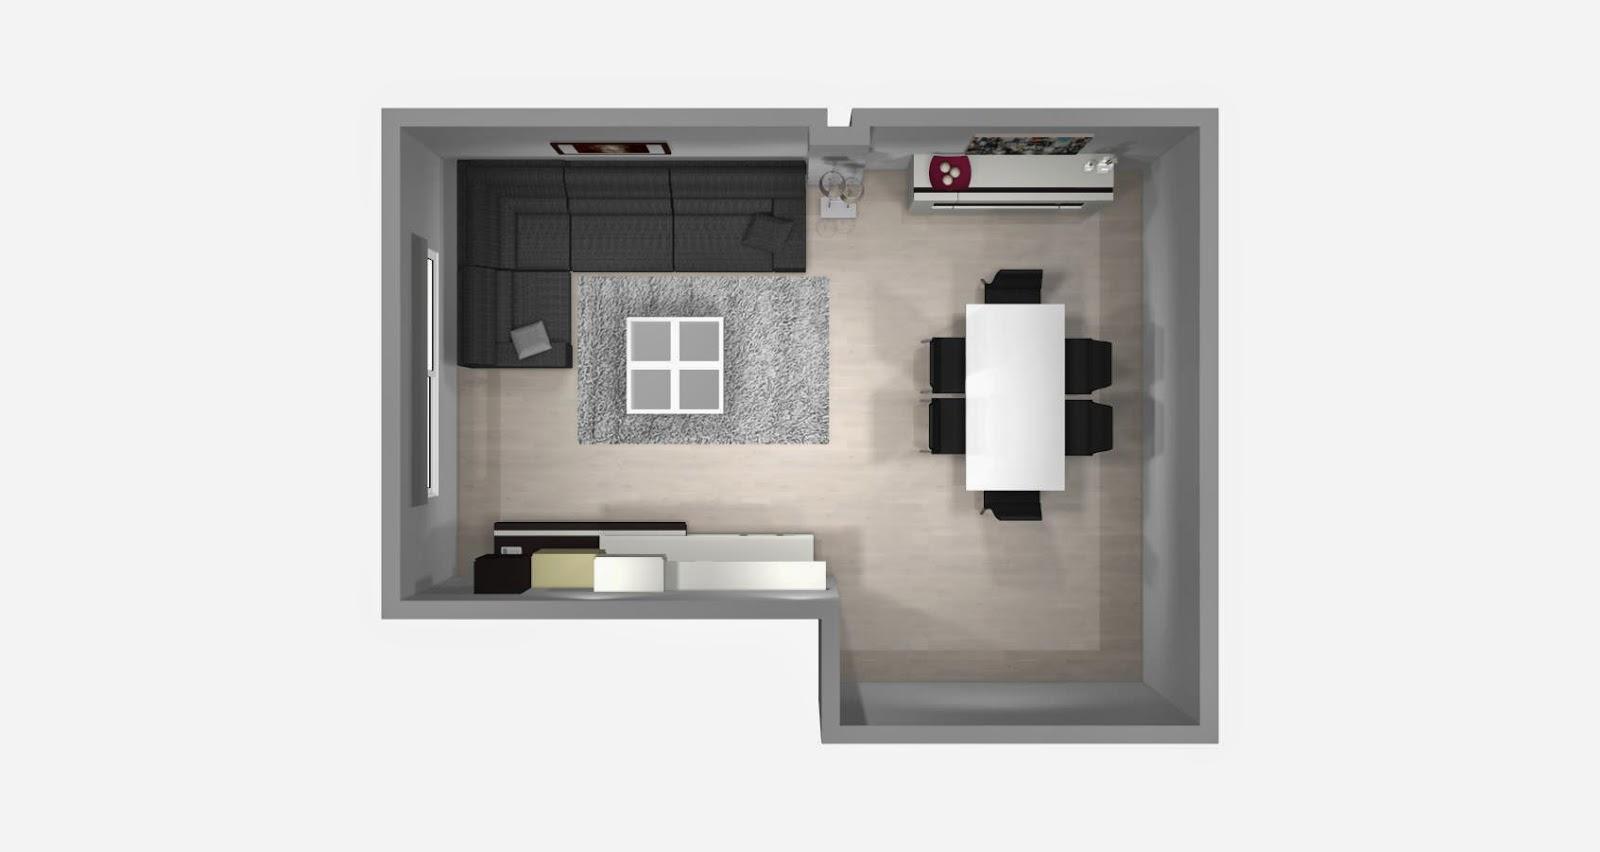 Tienda muebles modernos muebles de salon modernos salones de dise o madrid muebles de salon 3d - Planta de salon ...